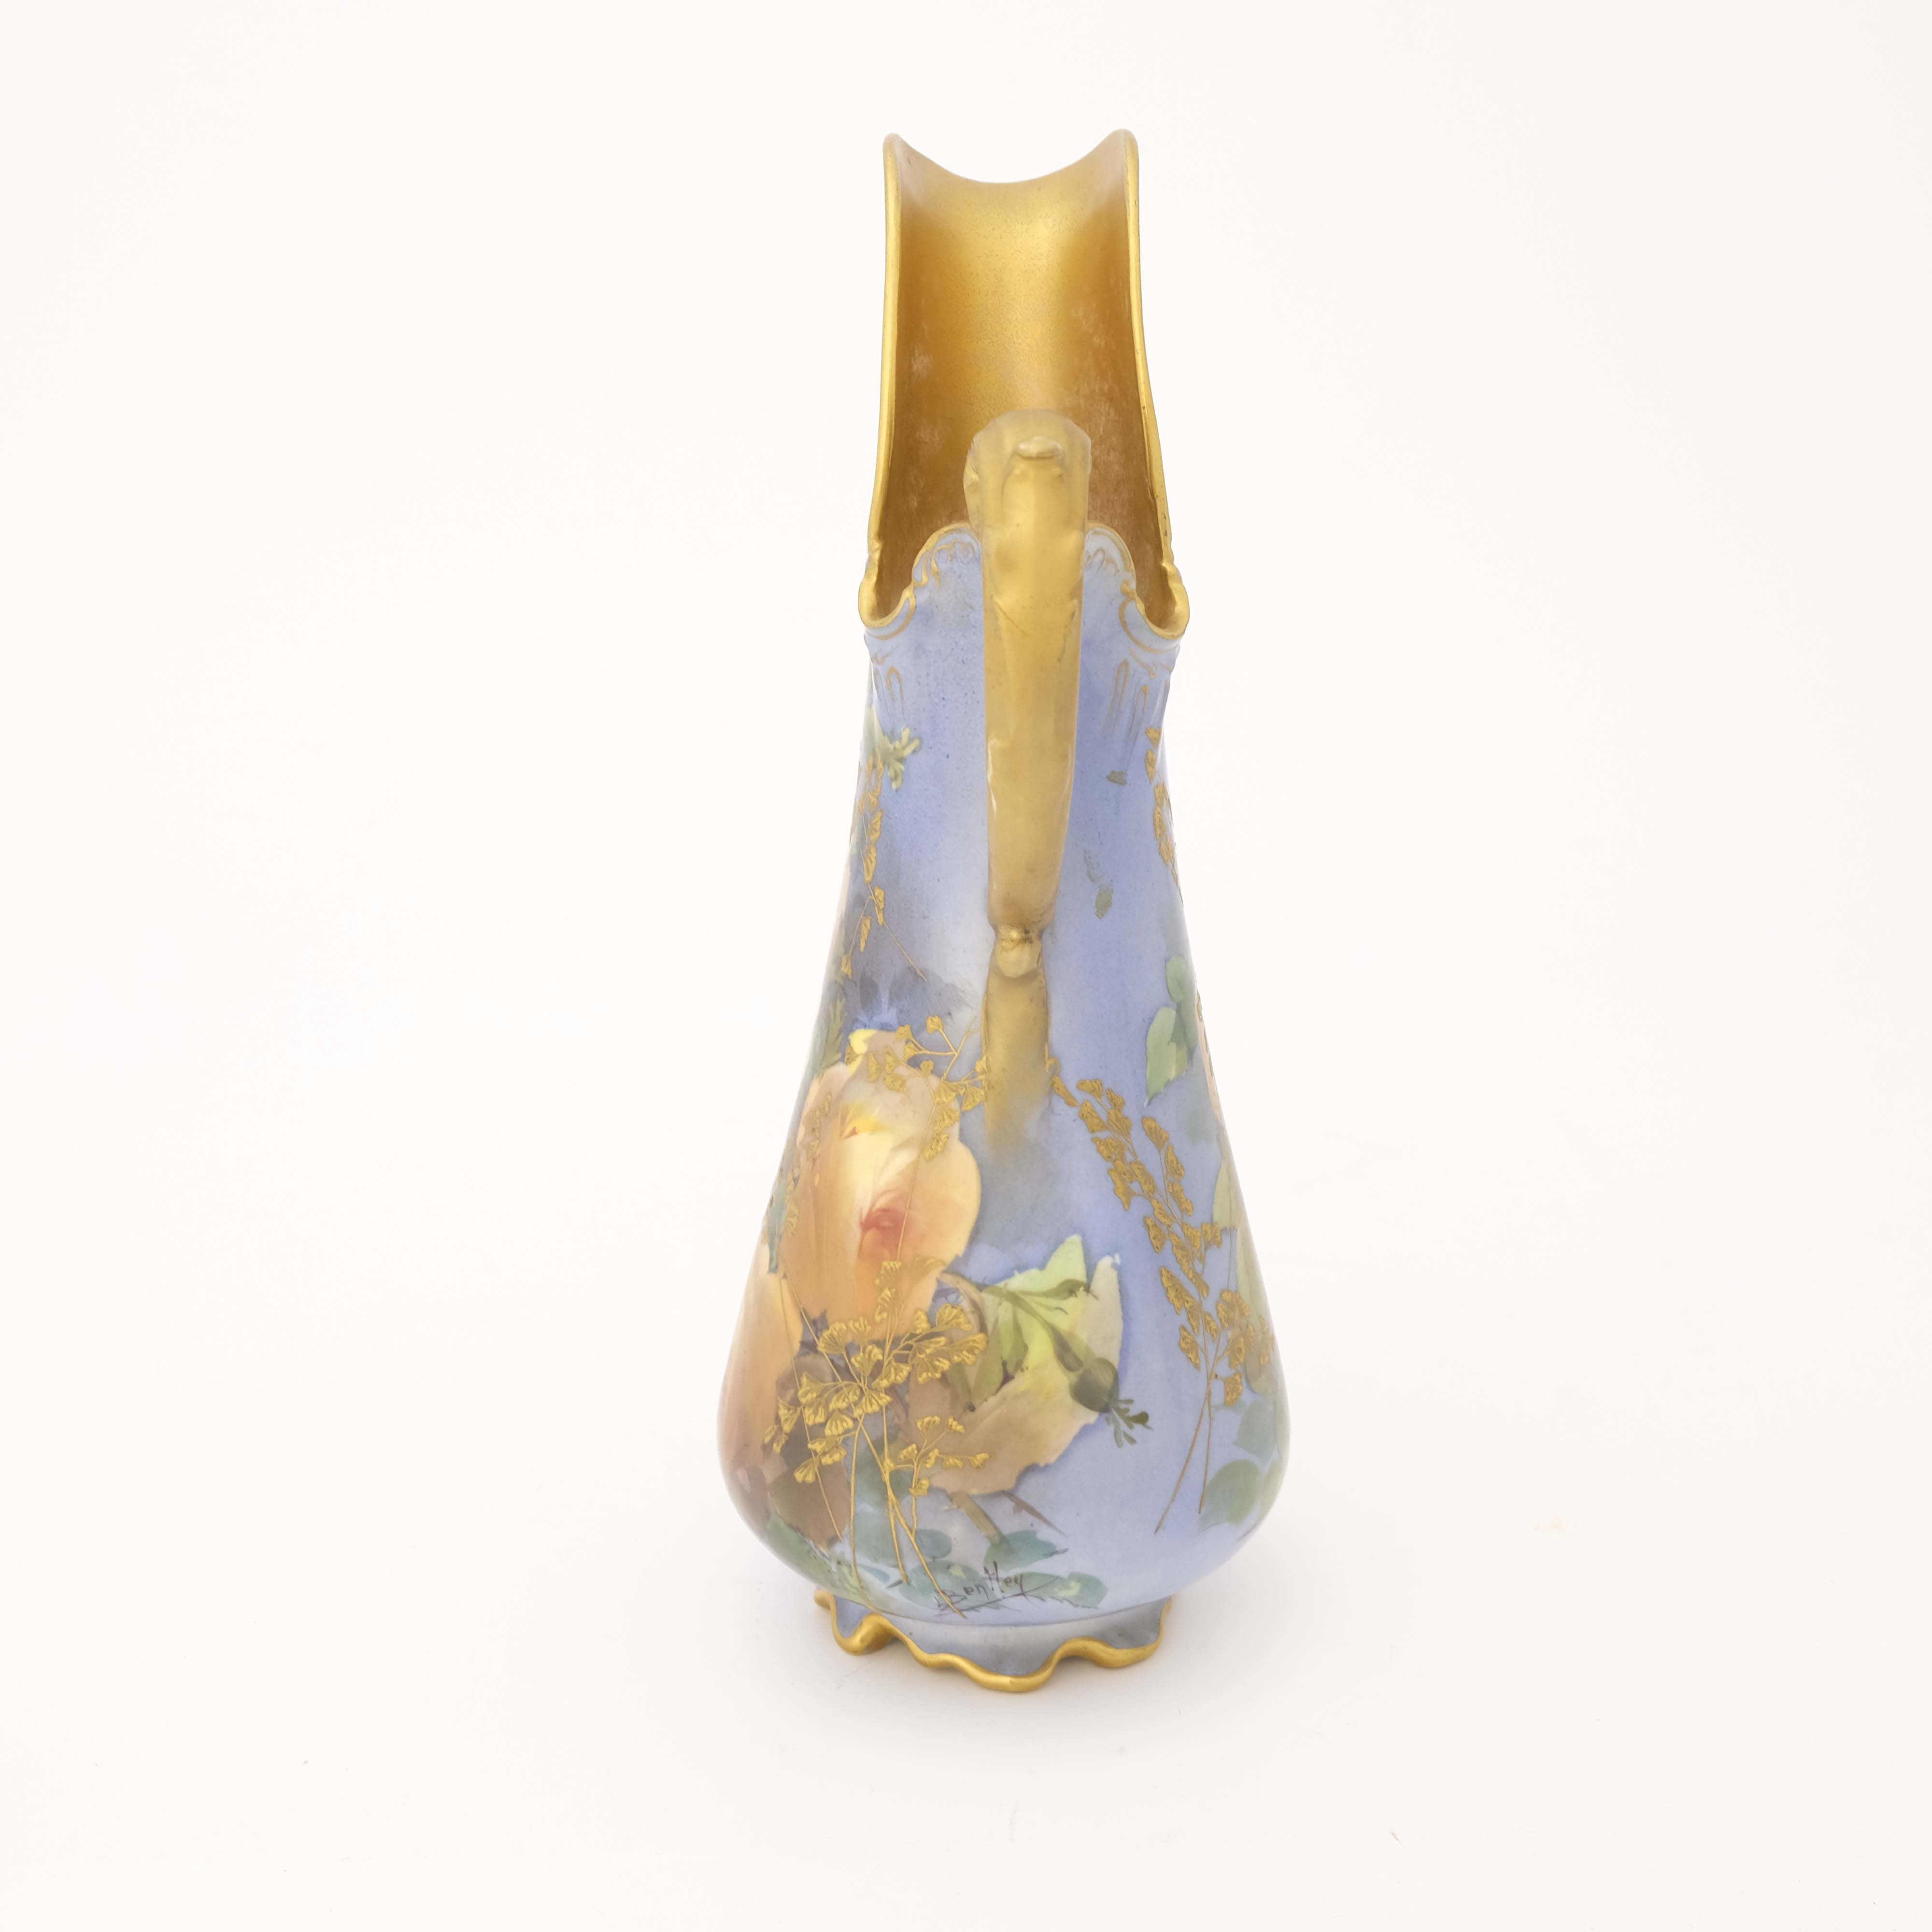 Leonard Bentley for Doulton Burslem, a rose painte - Image 4 of 6